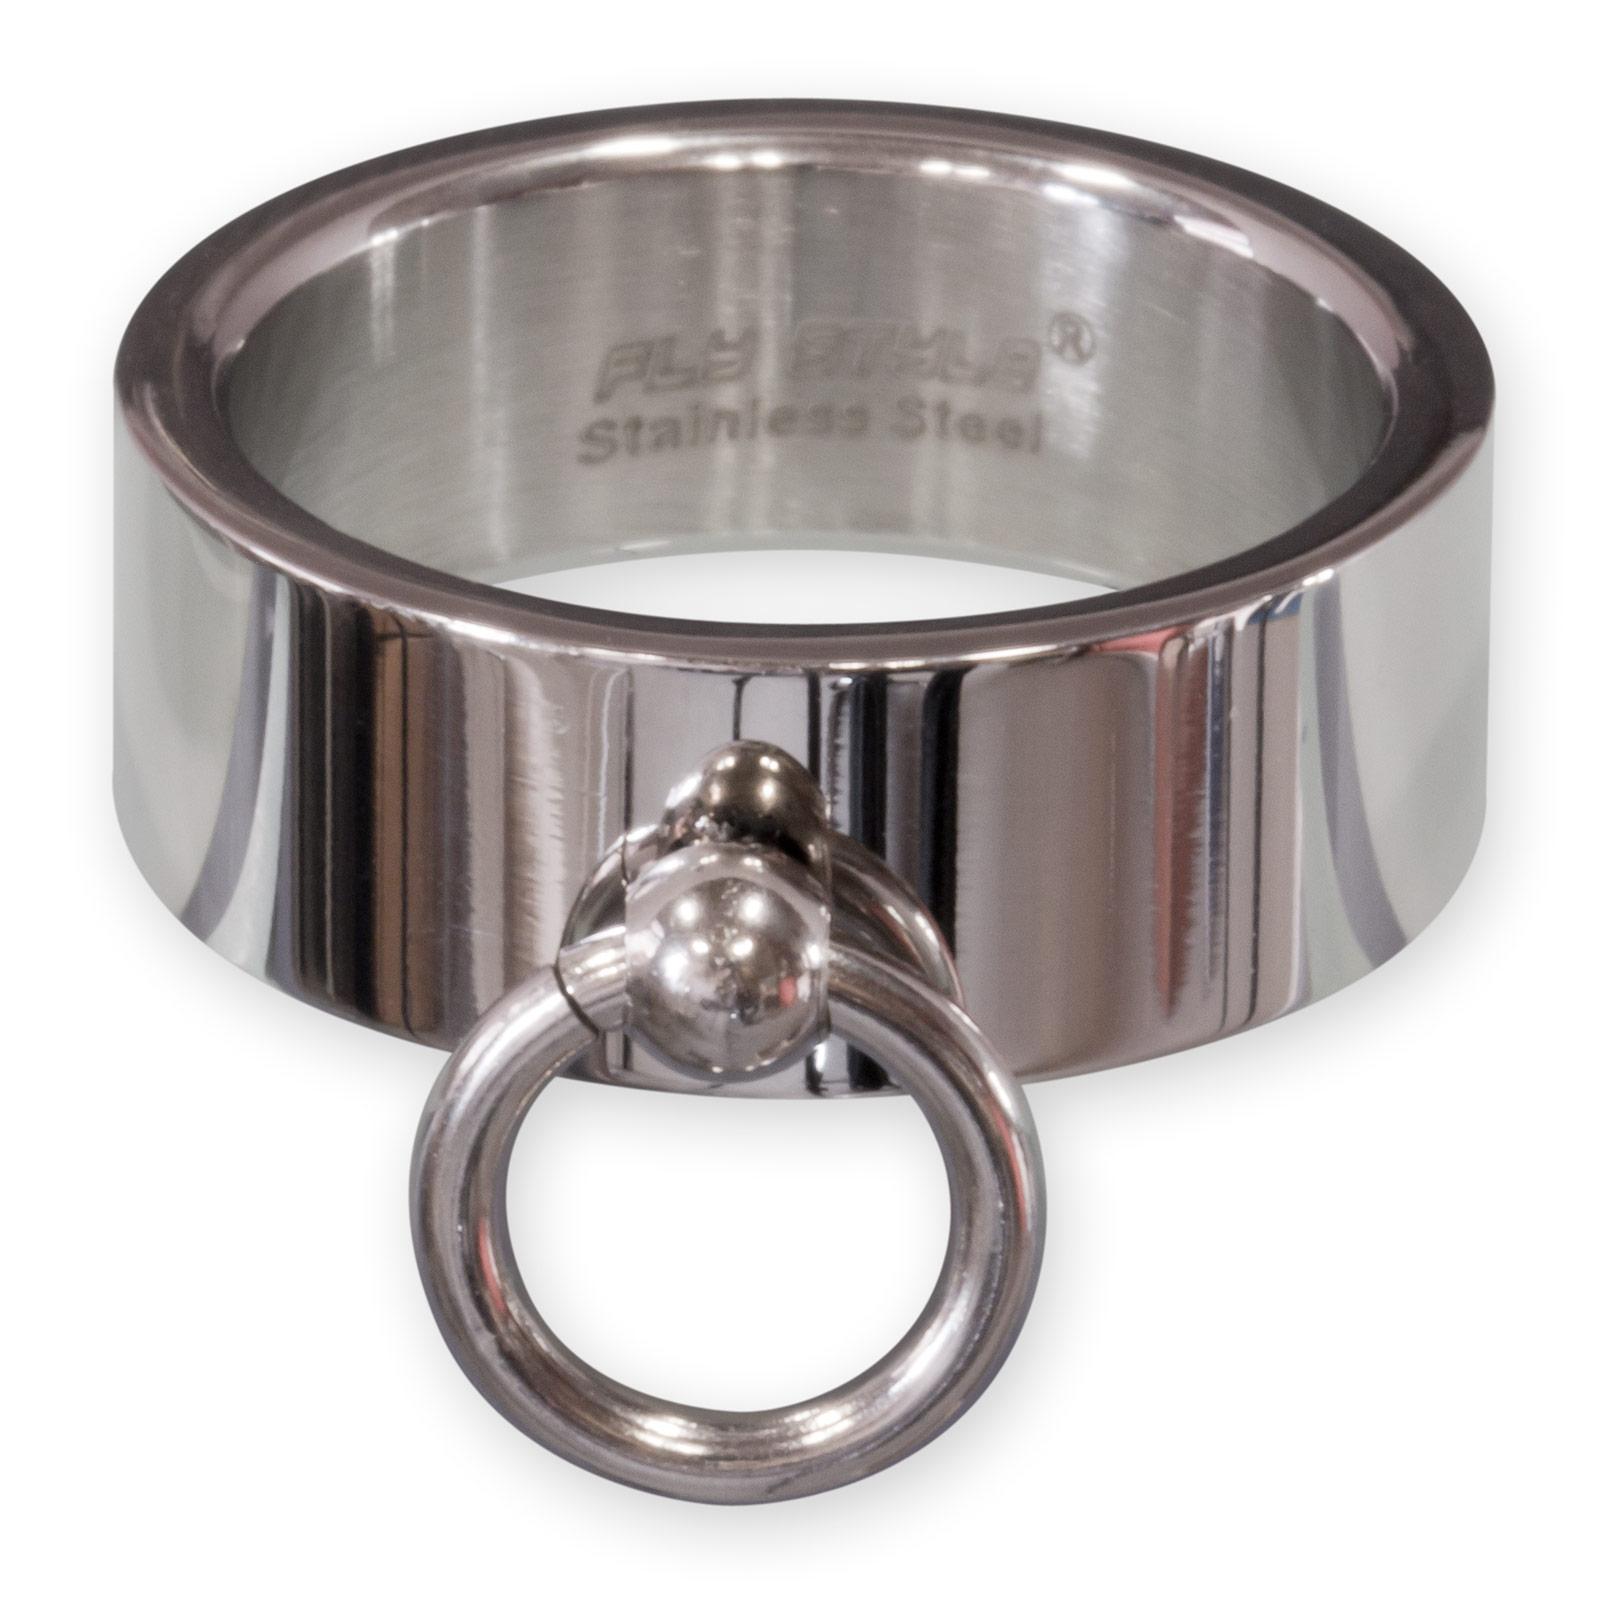 Ring der O Fingerring aus Edelstahl   8mm schmal in silber matt oder poliert